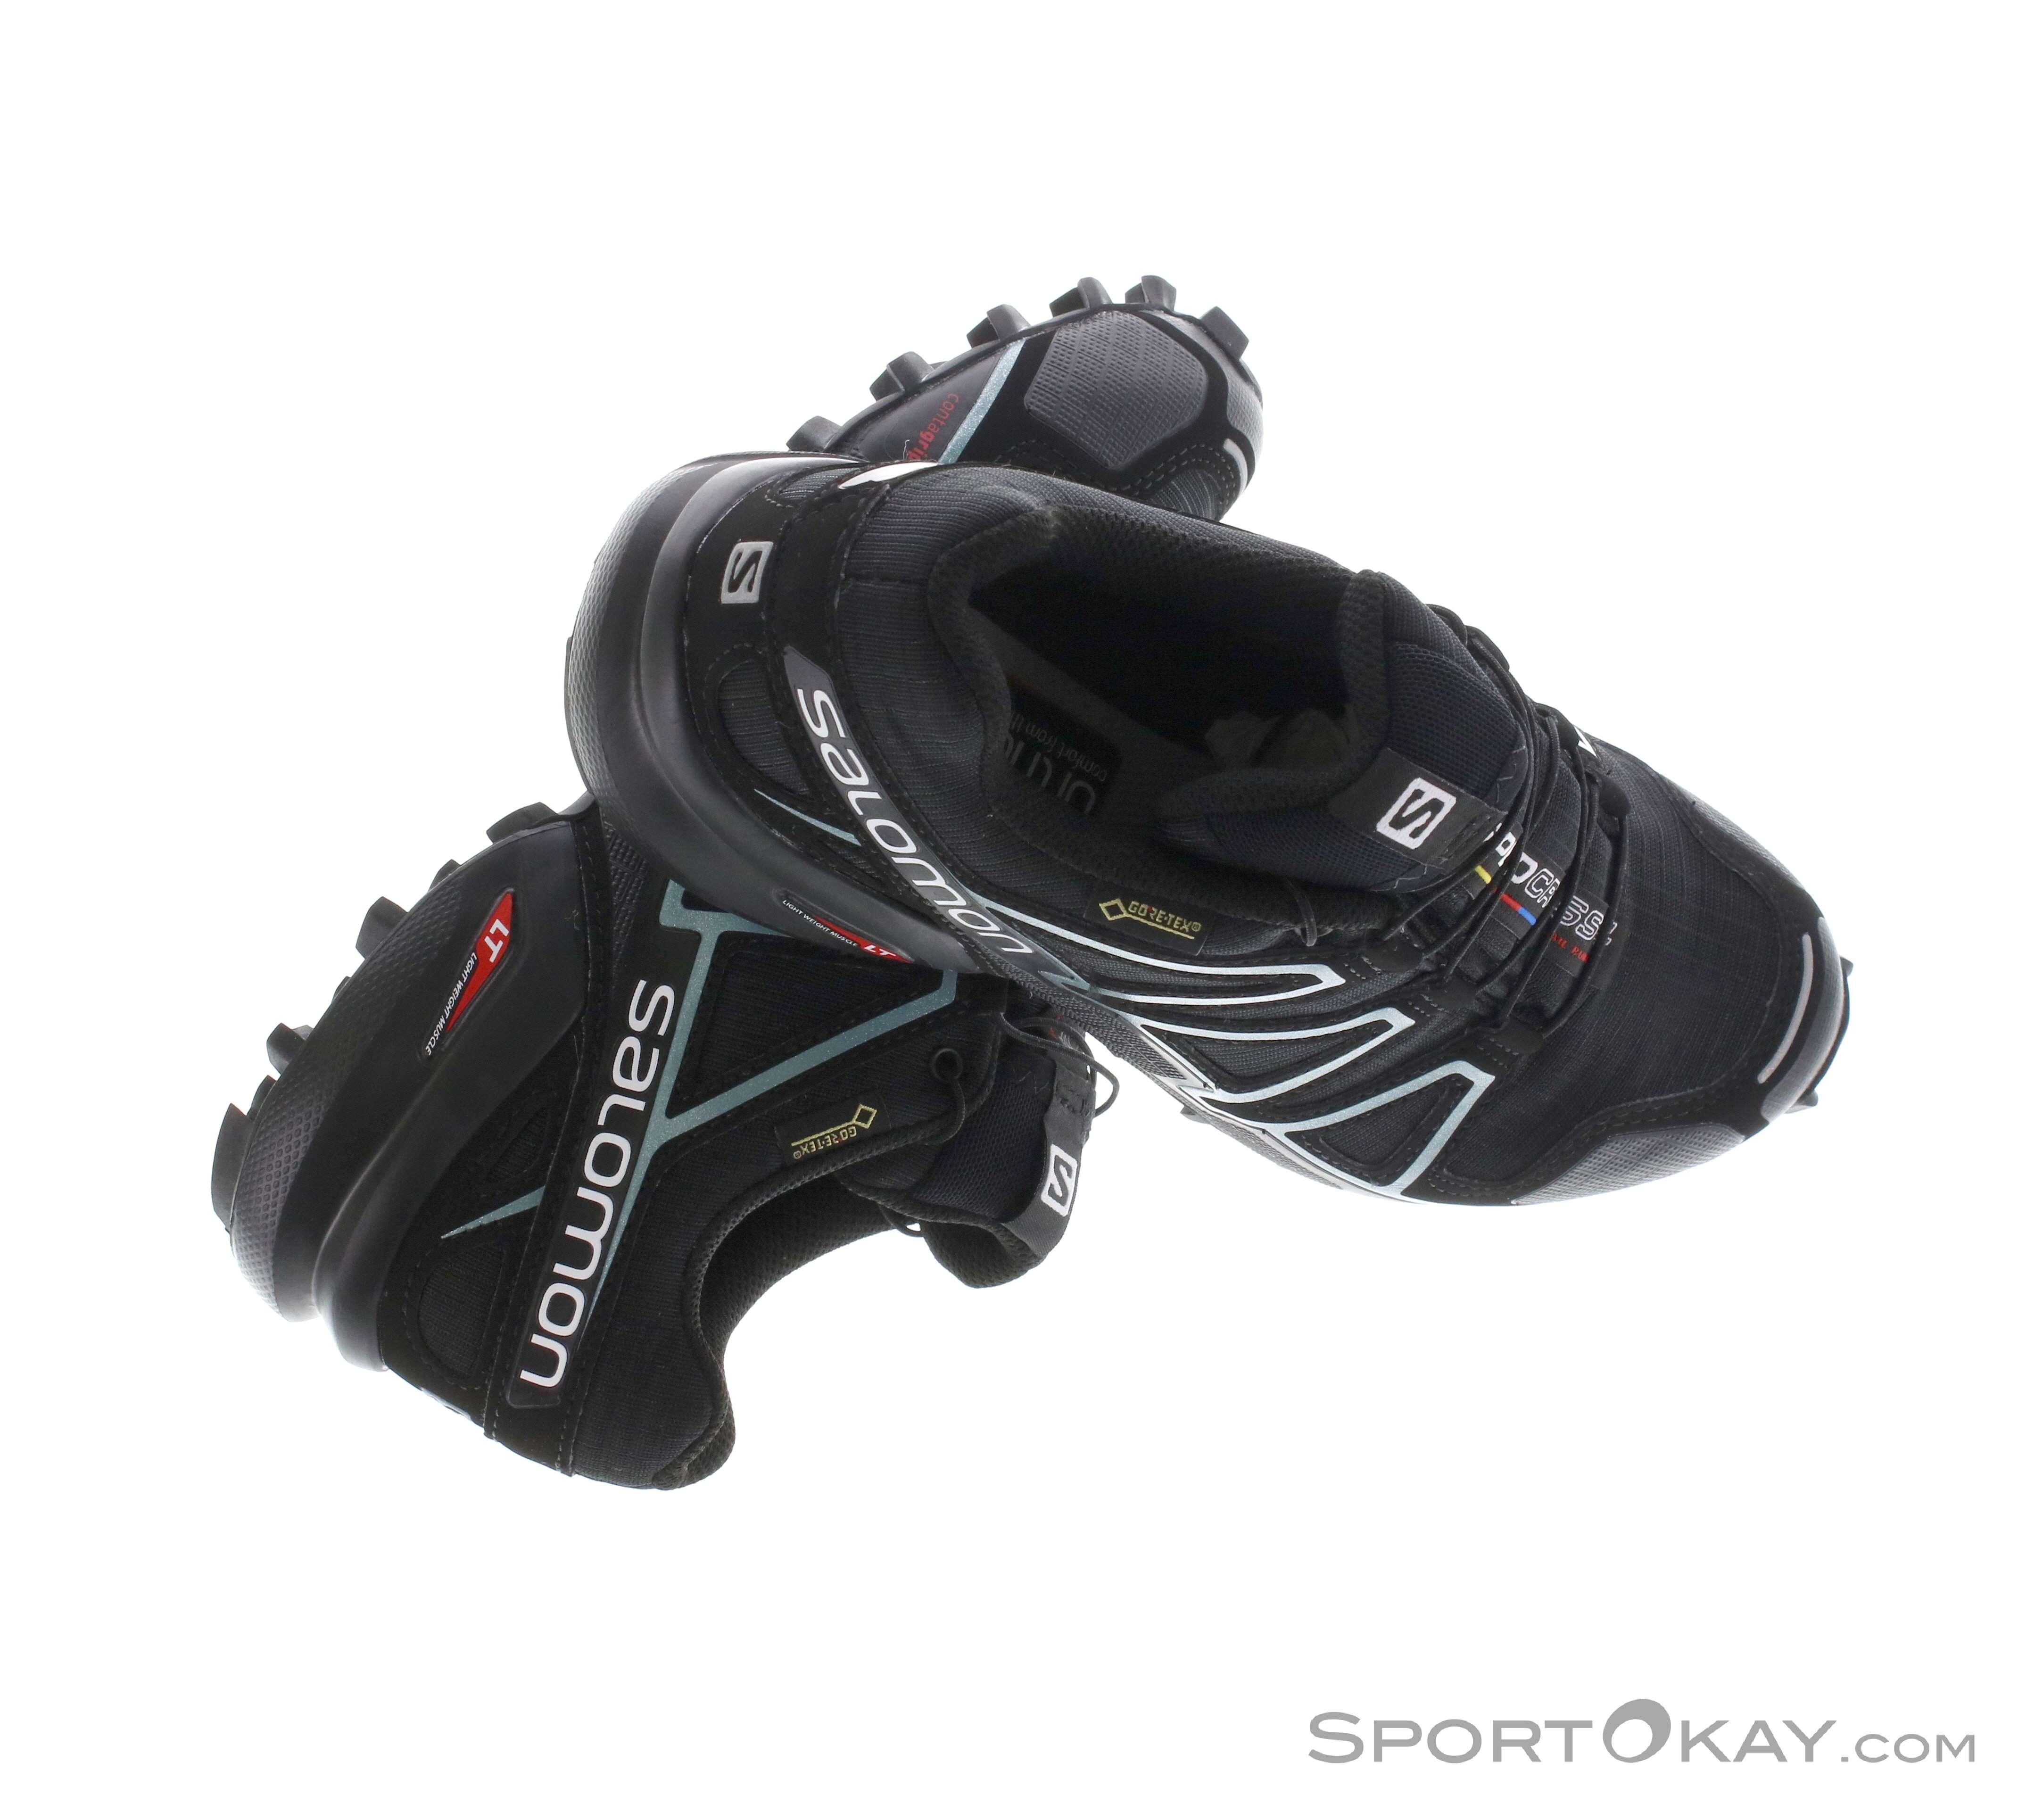 à bas prix a5665 93164 Salomon Salomon Speedcross 4 Womens Running Shoes Gore-Tex